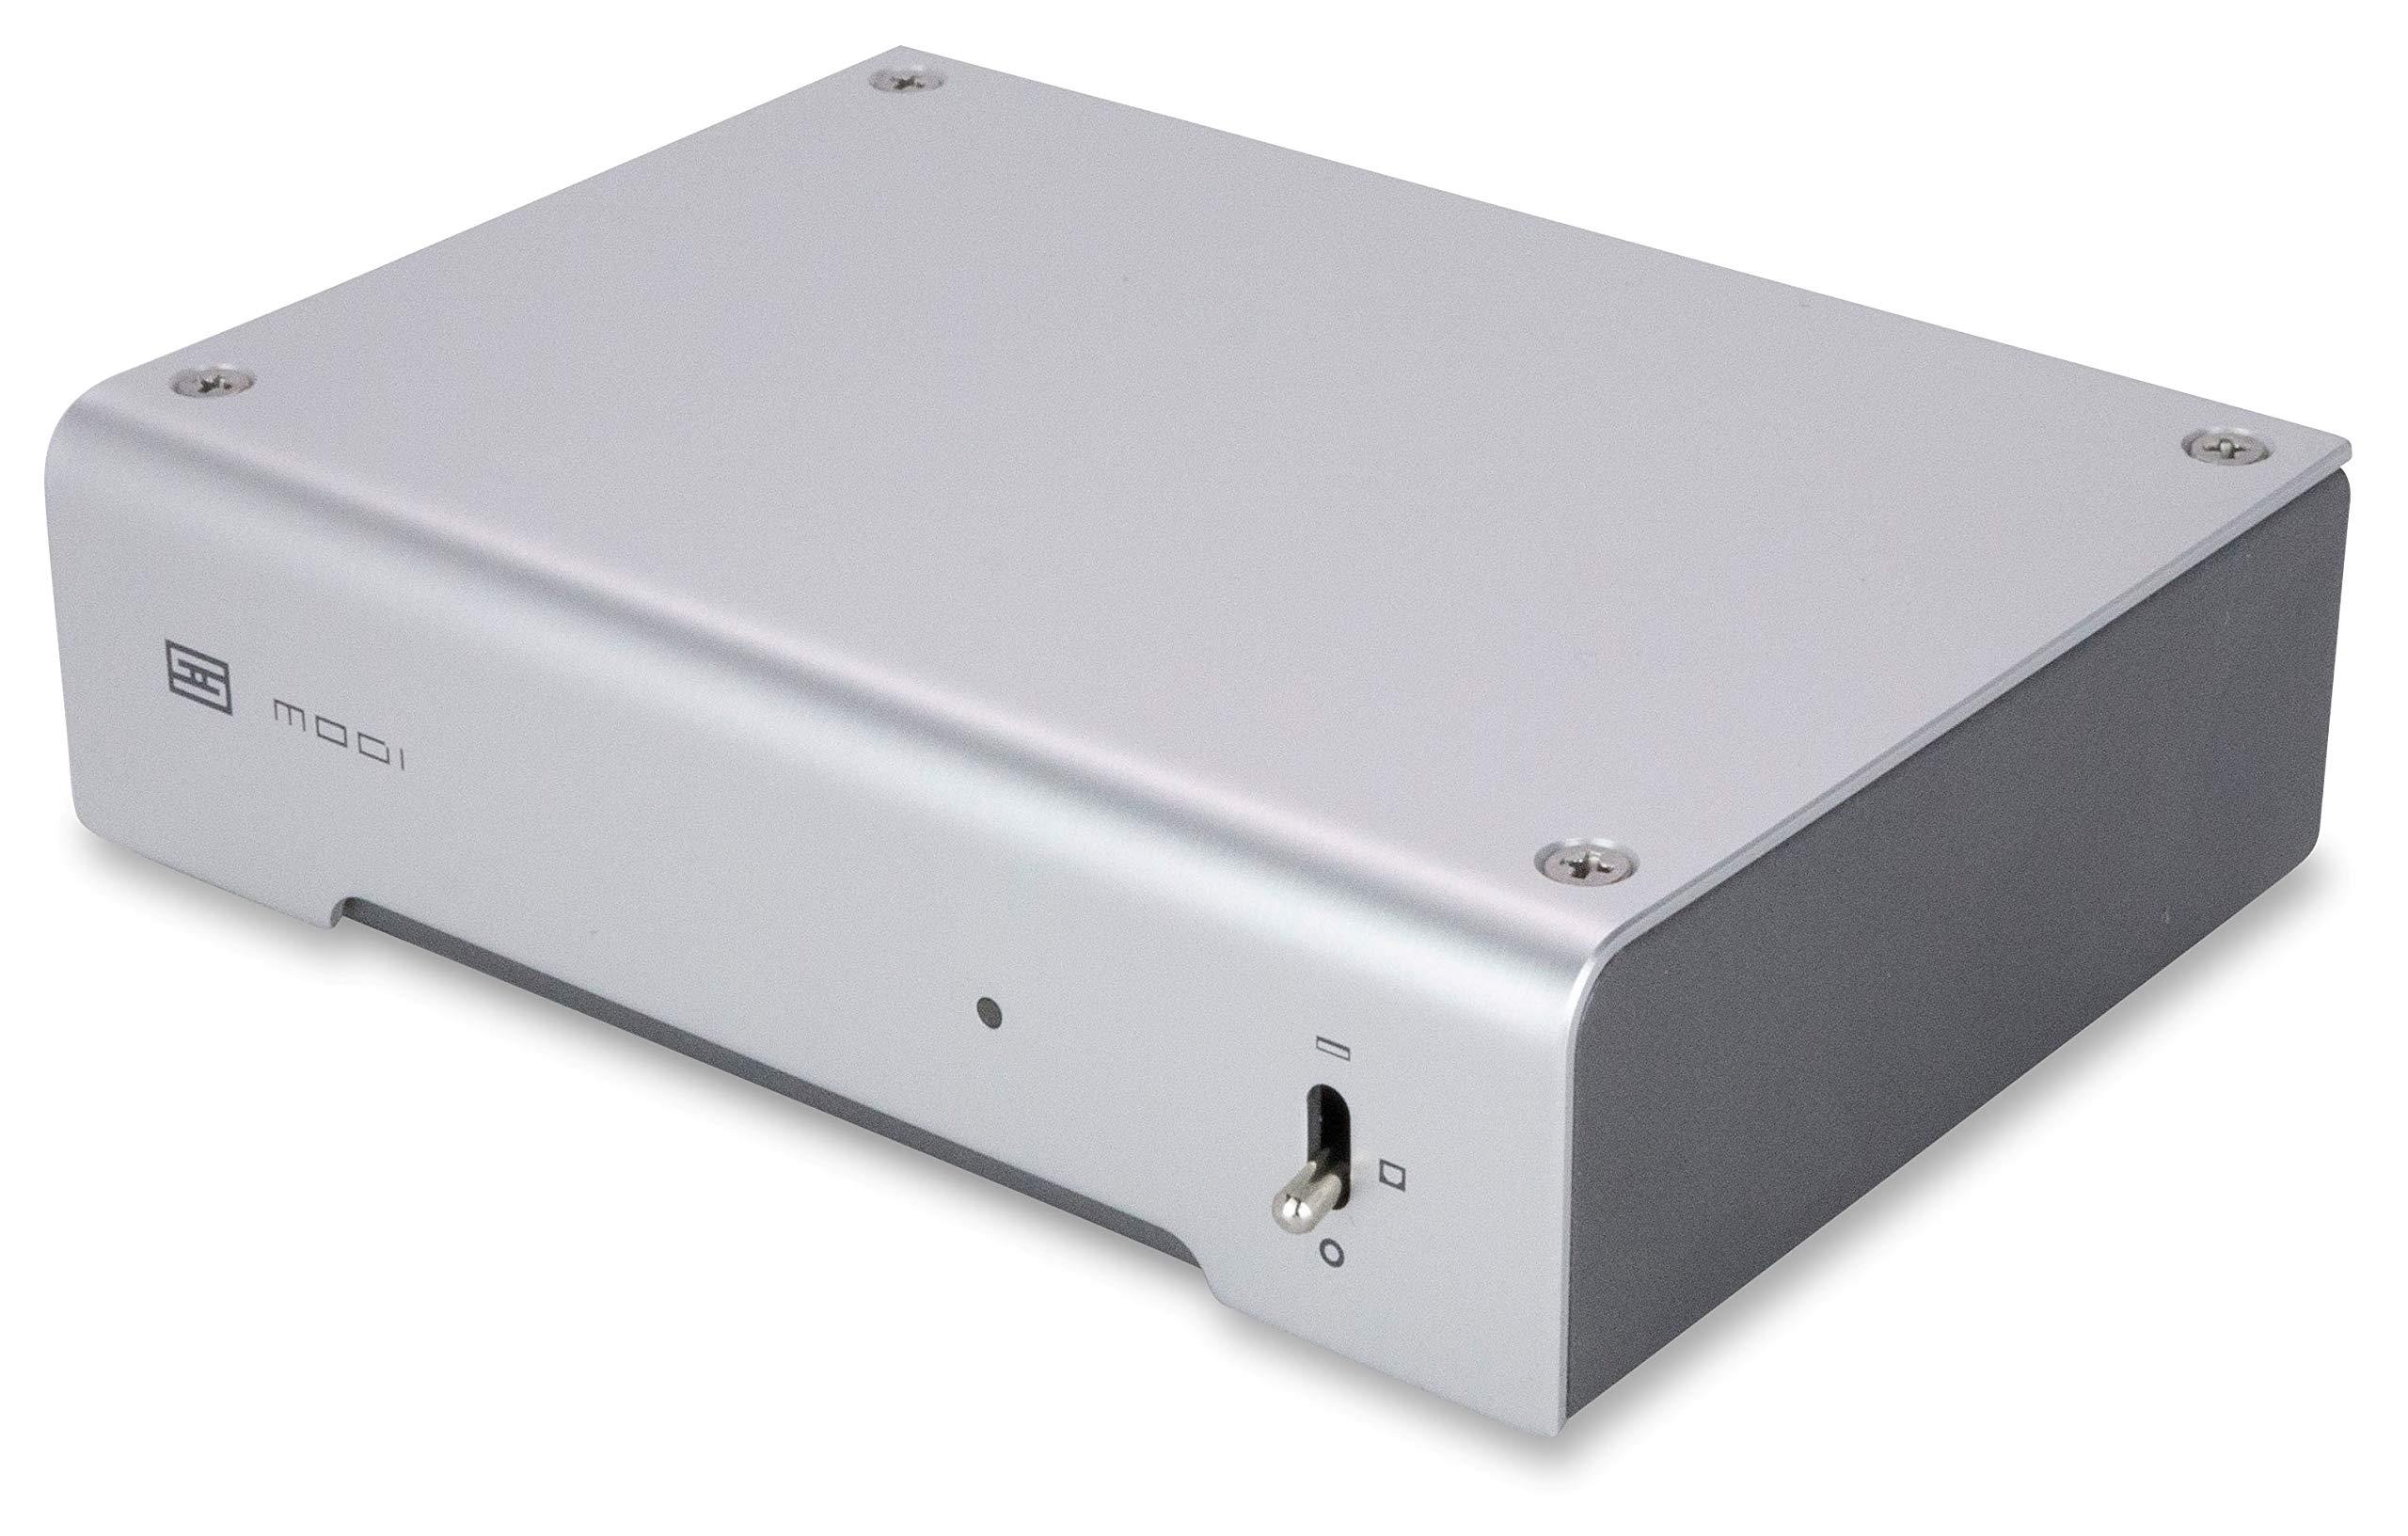 Schiit Modi 3 D/A Converter - Delta-Sigma DAC product image